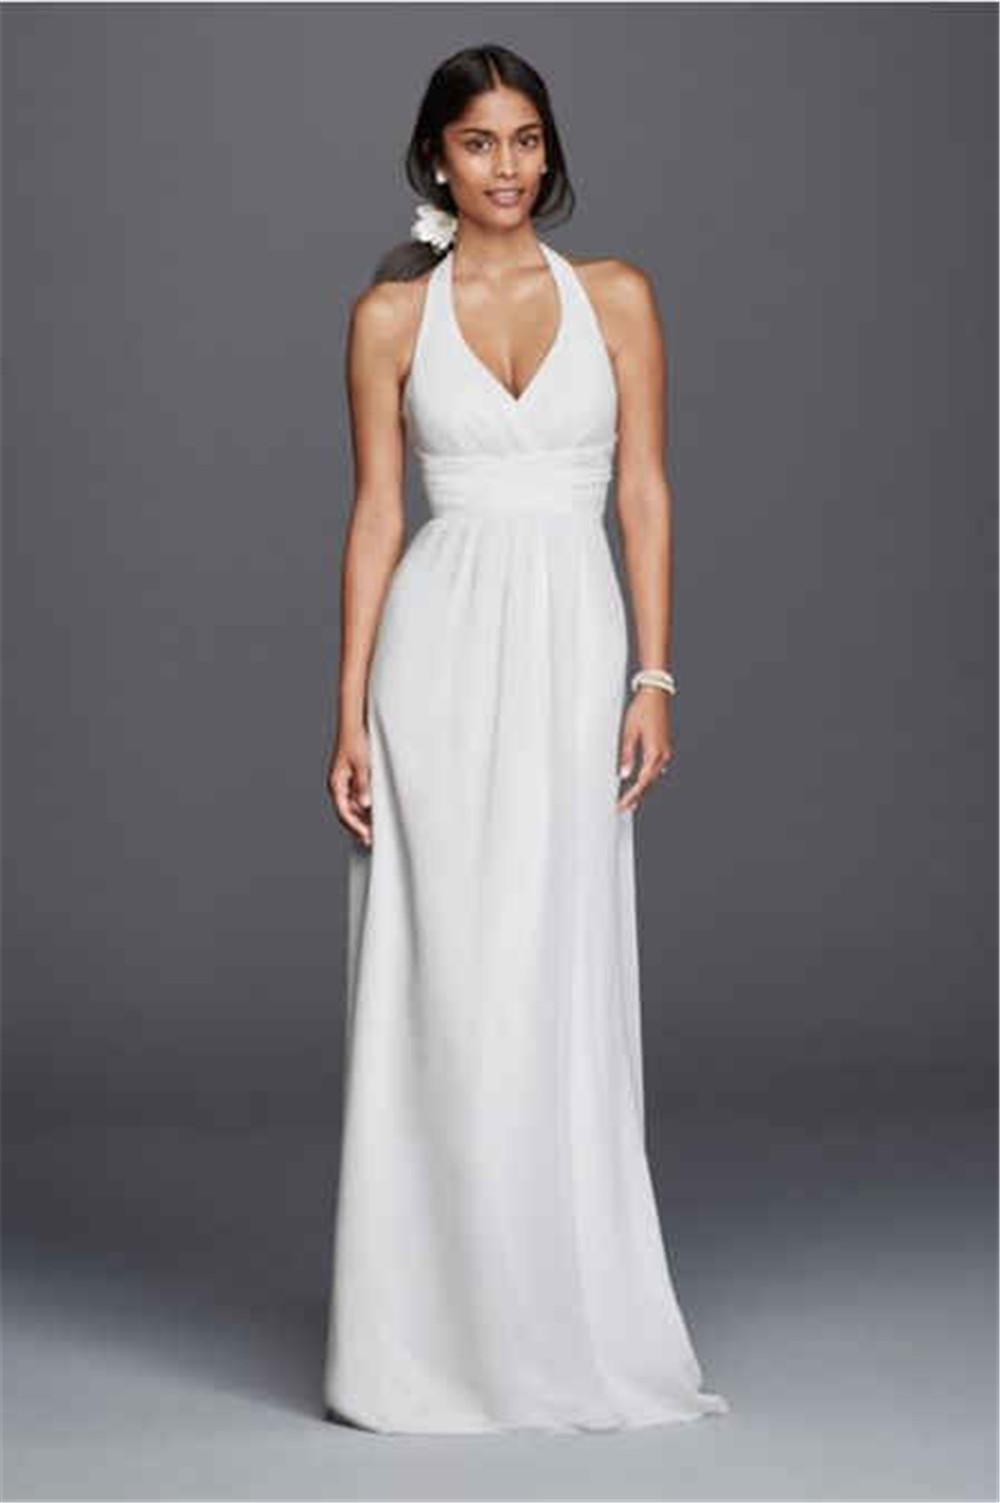 Wedding Halter Wedding Dress wholesale low back halter wedding dresses buy cheap neck chiffon sheath dress sdwg0394 lower empire waistline simple floor length bridal dress